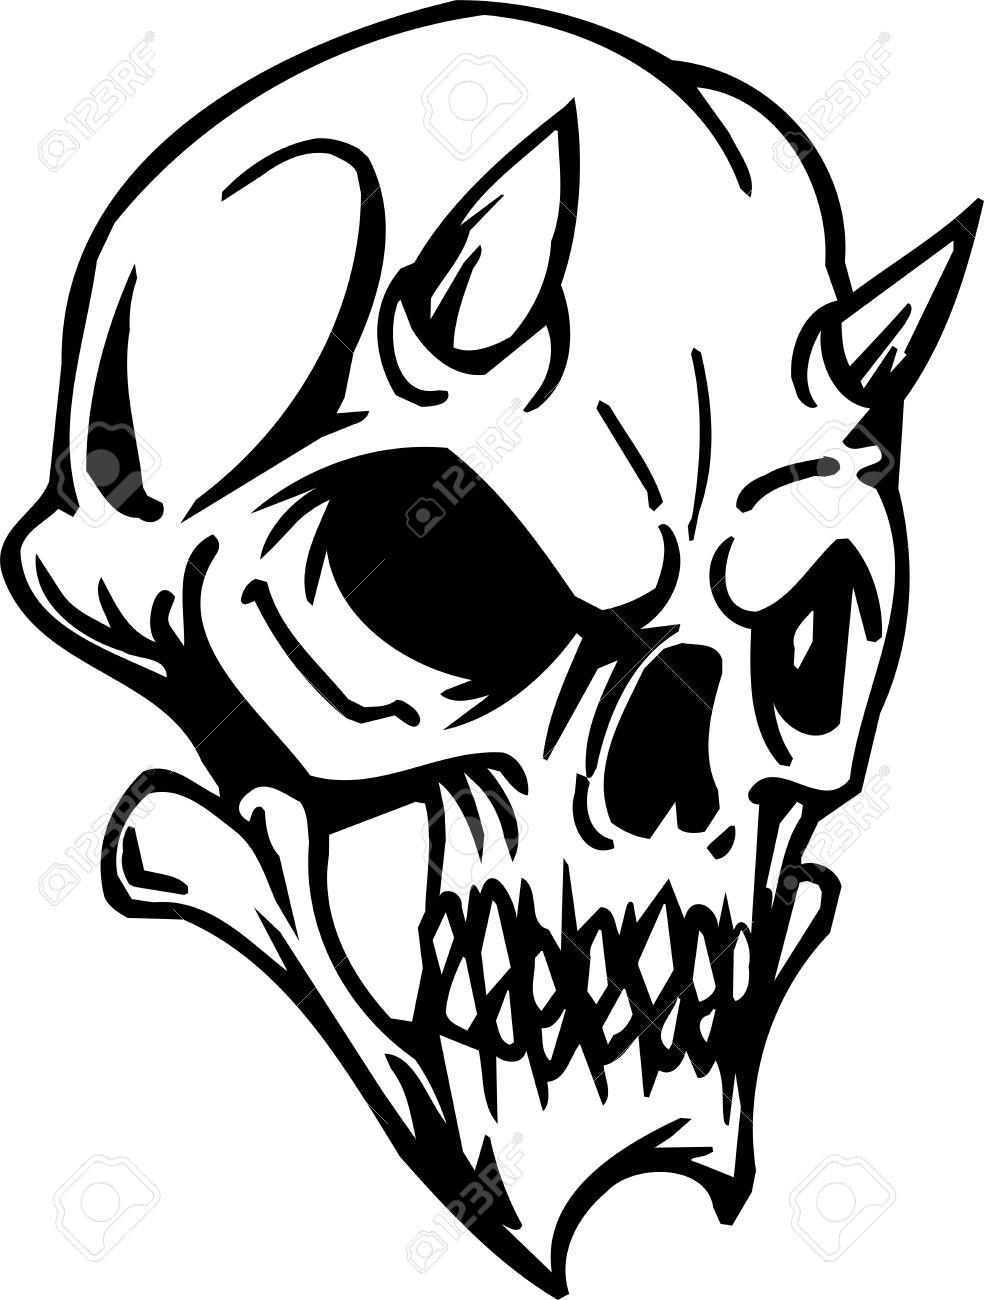 984x1300 Drawn Skull Halloween